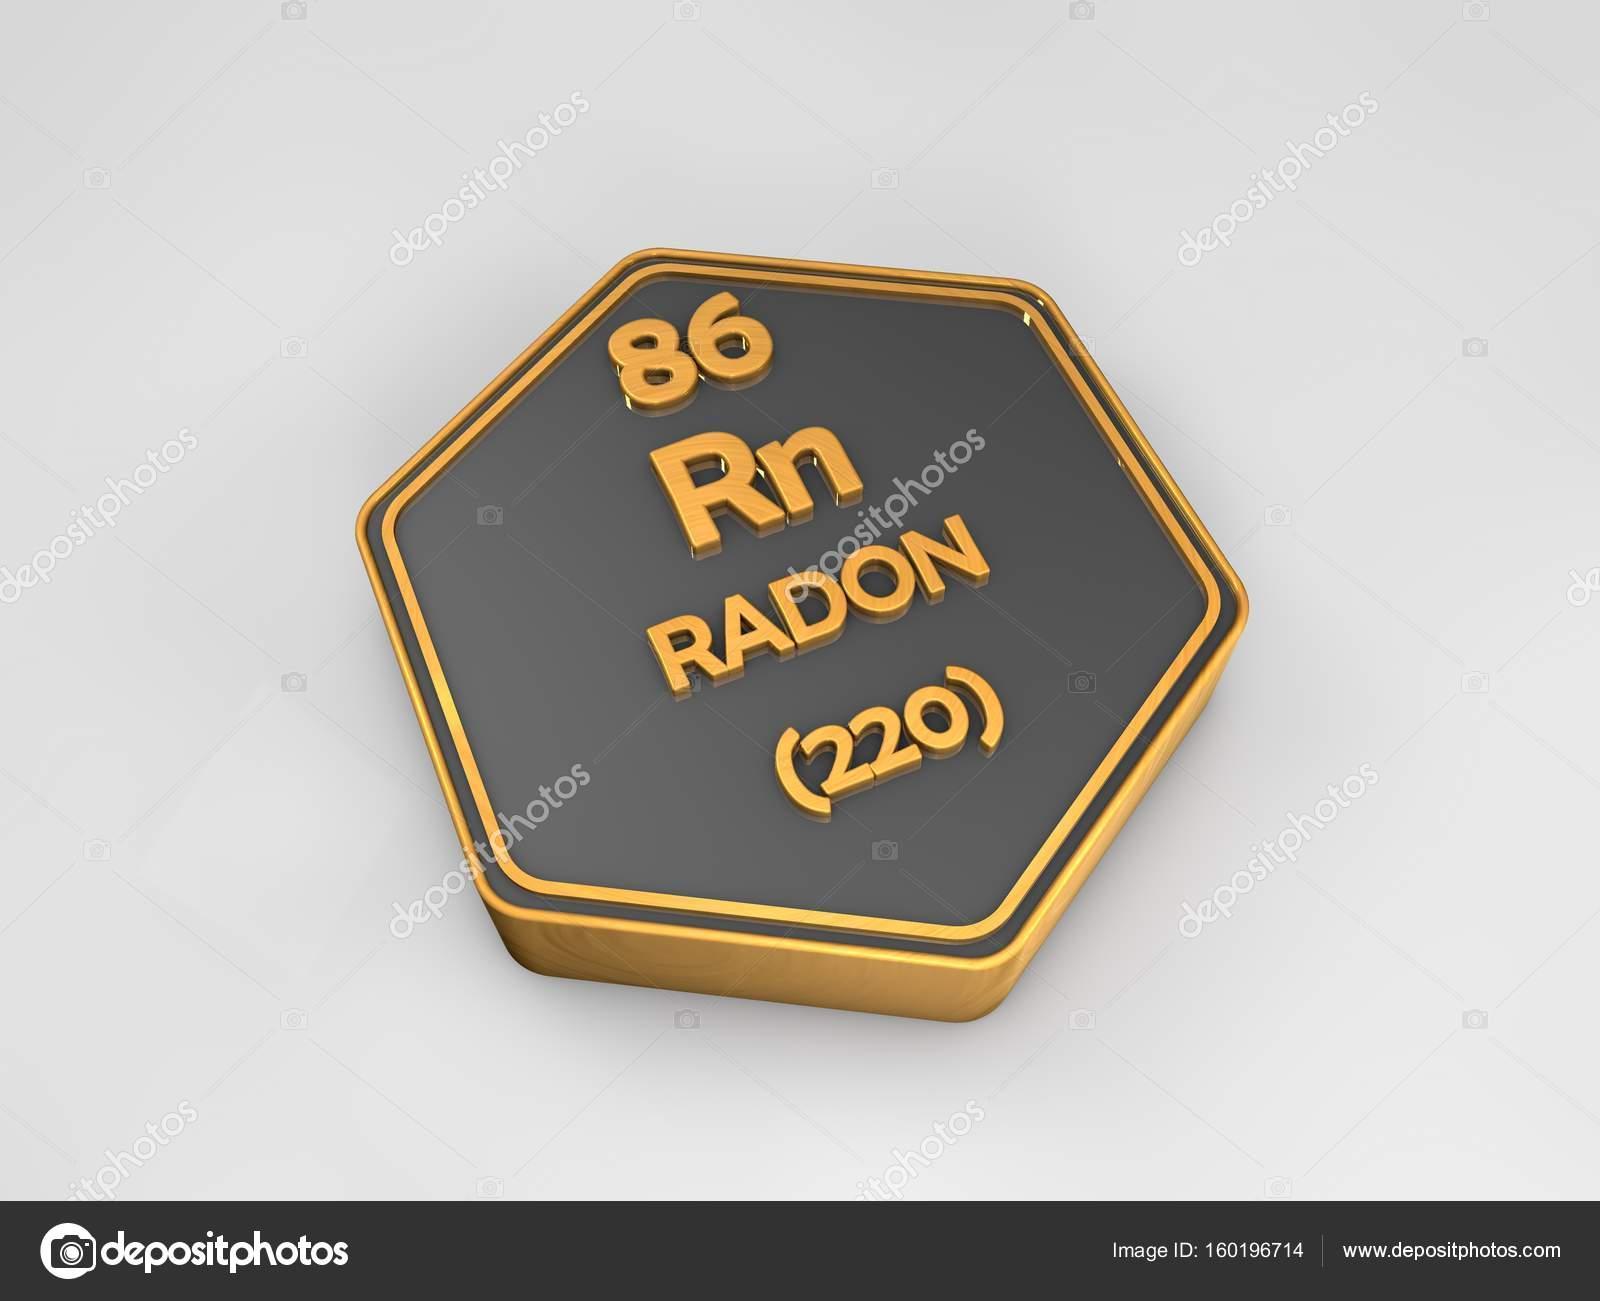 Radon Rn Chemical Element Periodic Table Hexagonal Shape 3d